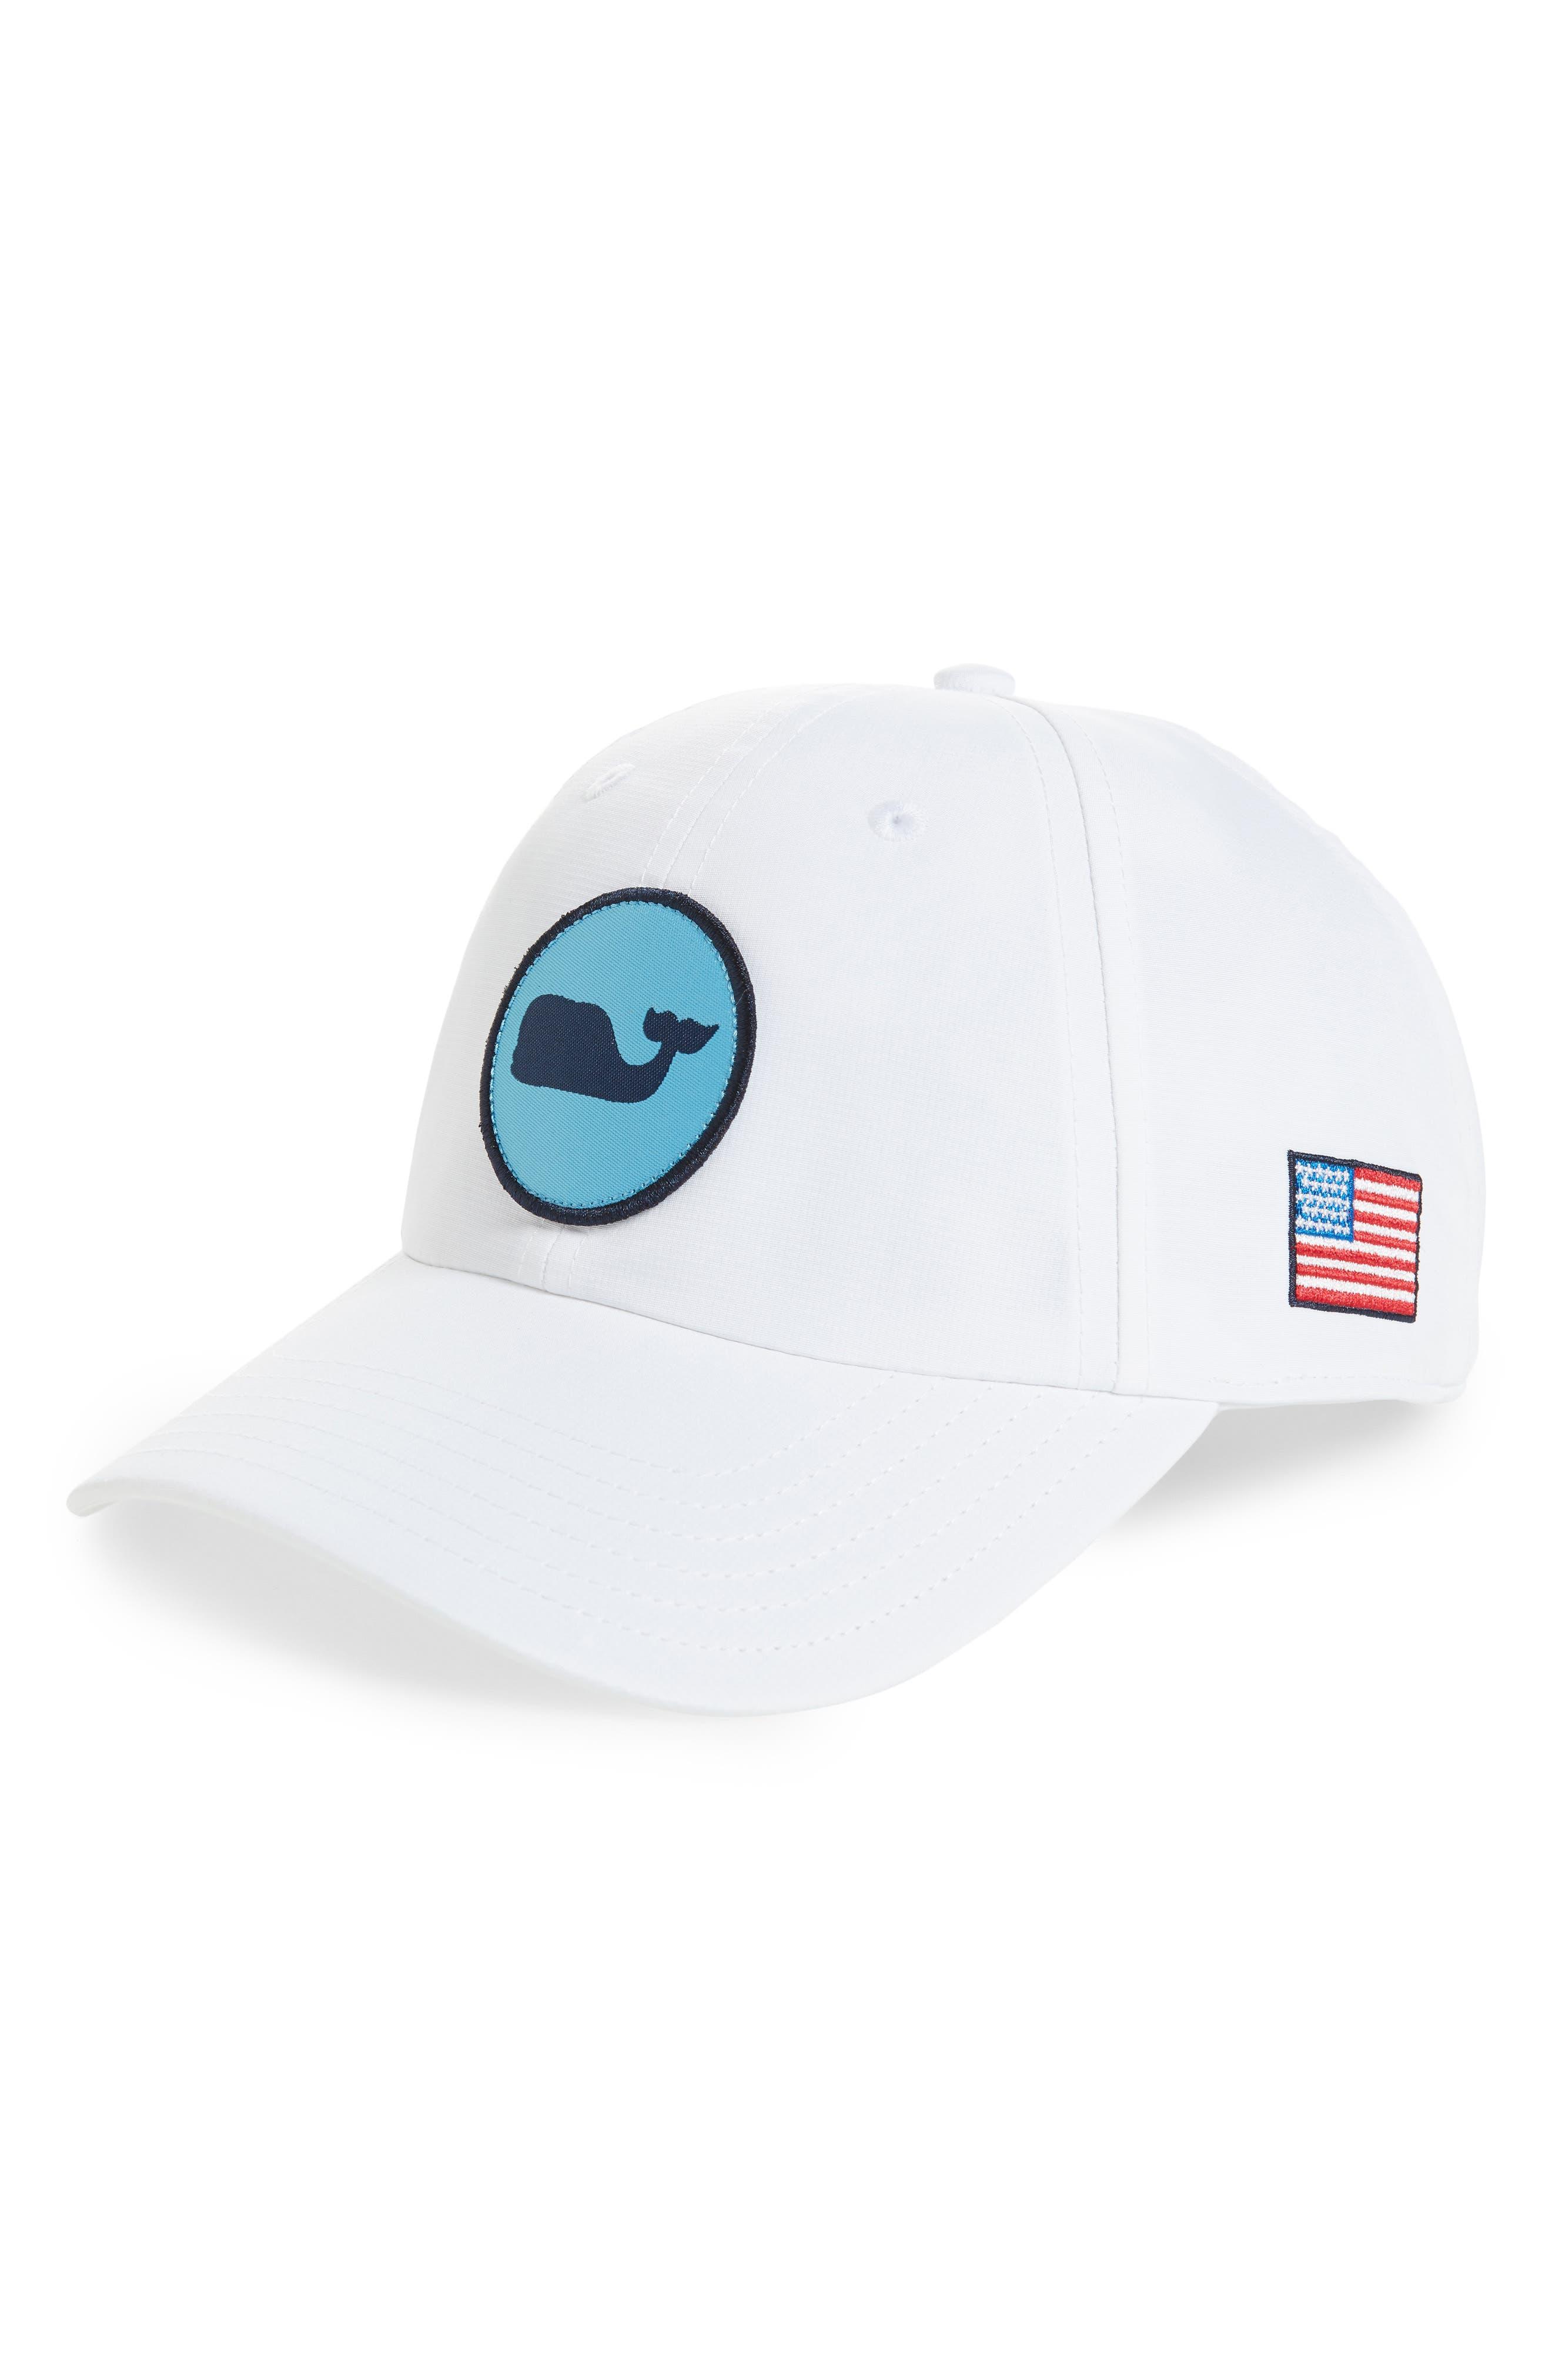 Perf Classic Woven Whale Ball Cap,                         Main,                         color, White Cap